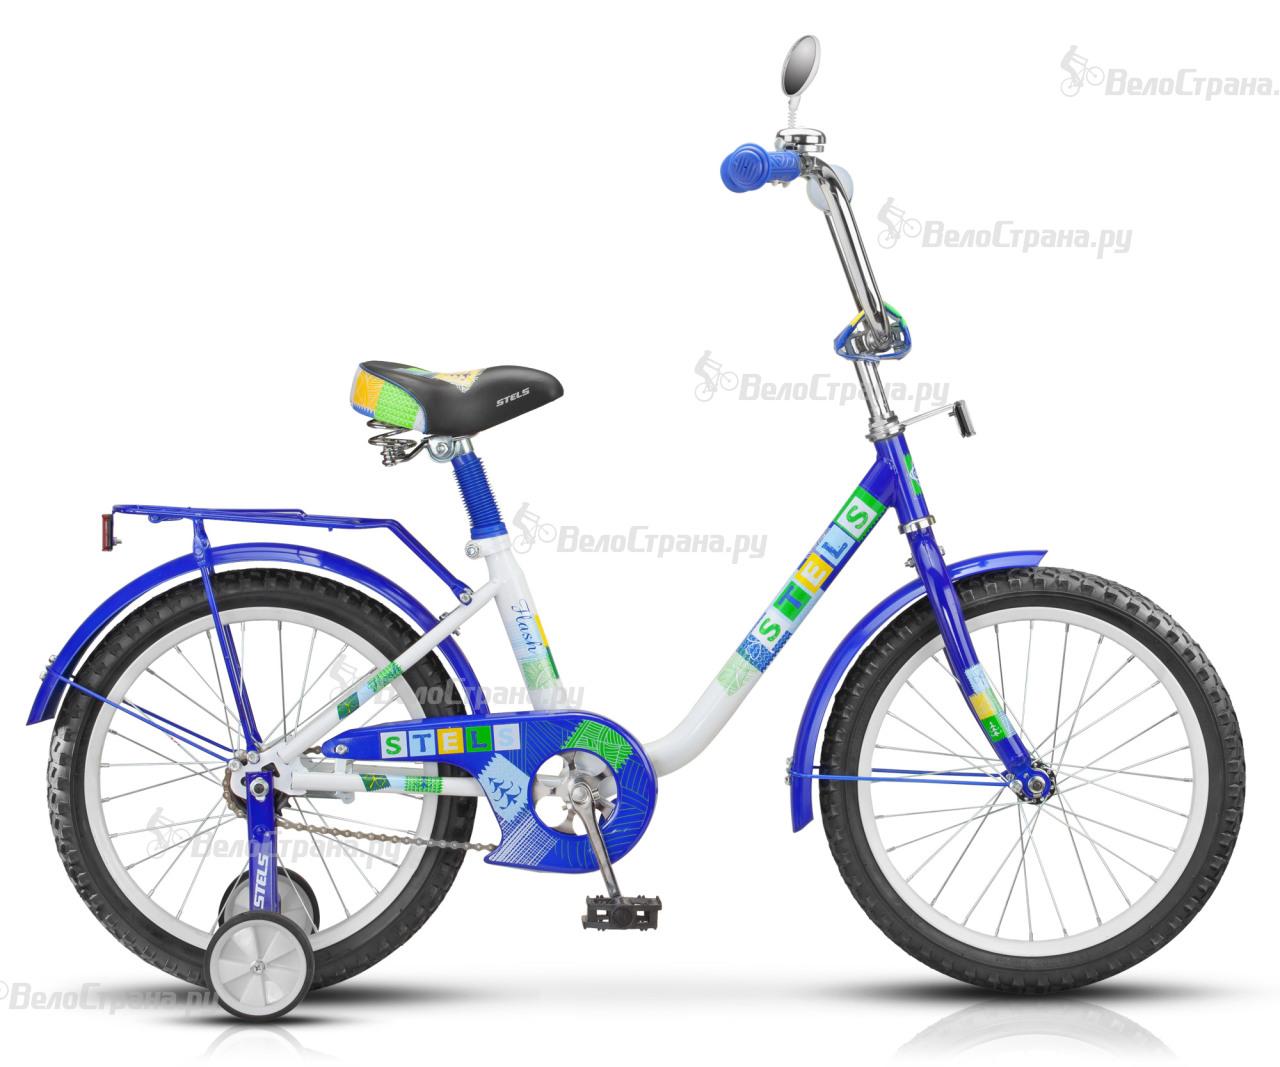 Велосипед Stels Flash 18 (2017) велосипед stels navigator 310 2016